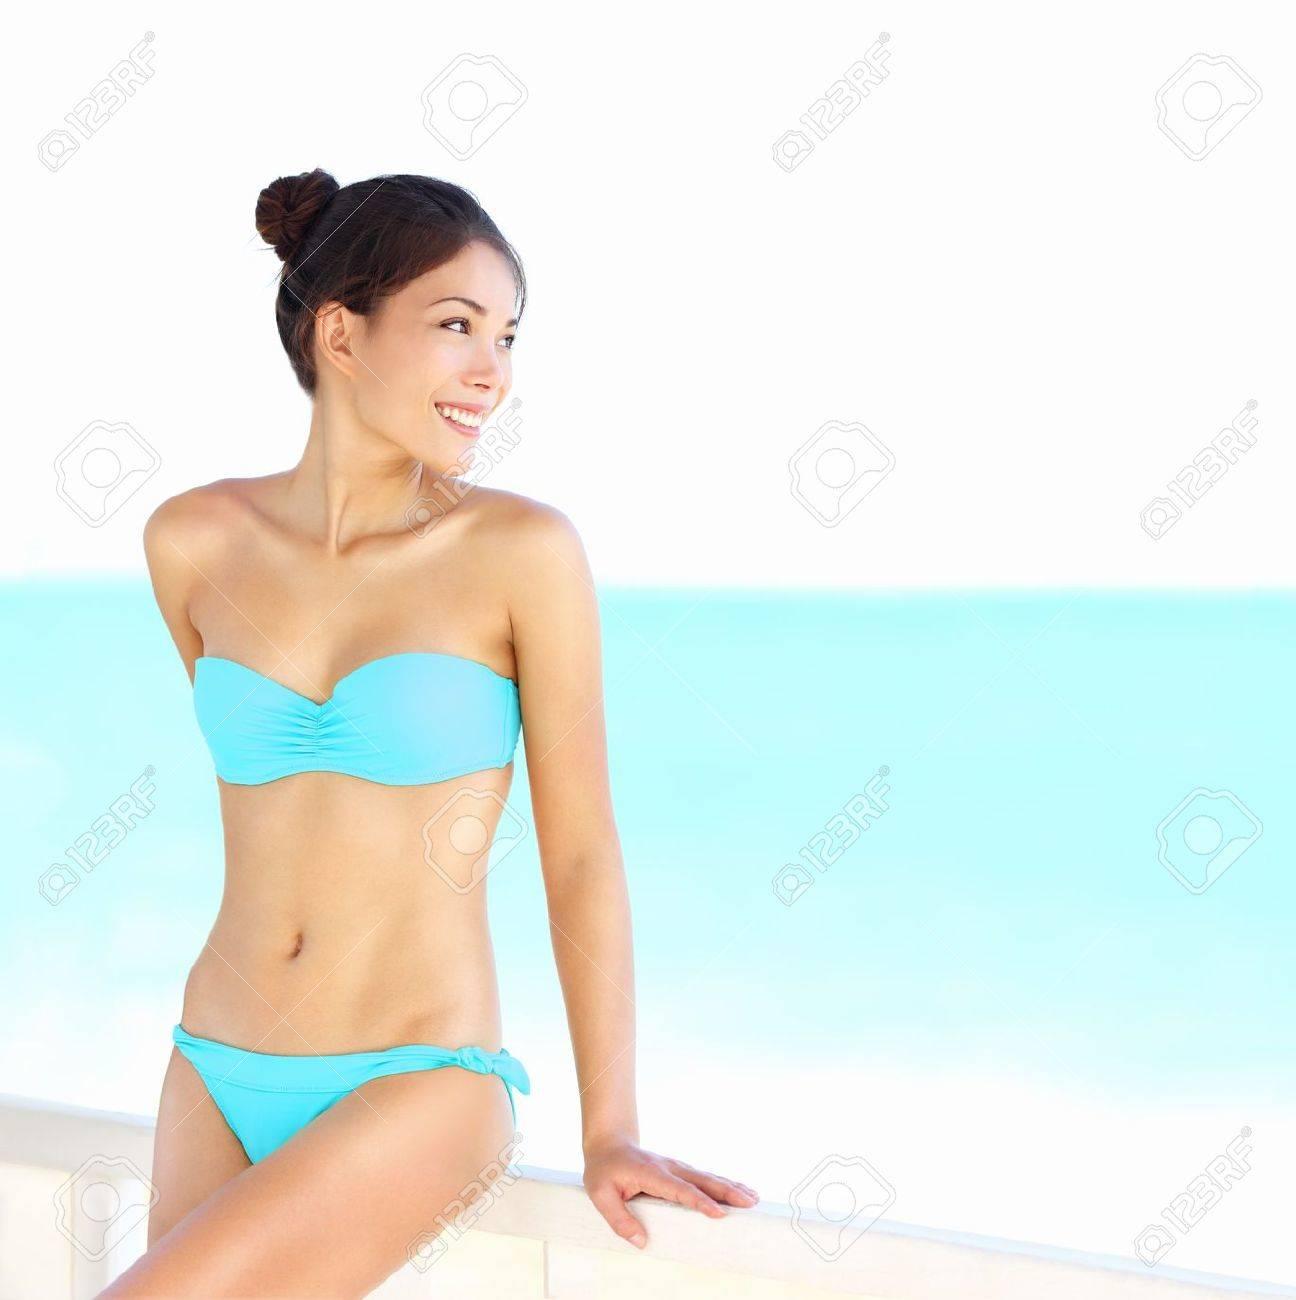 Beach bikini woman beauty on summer holidays vacation Stock Photo - 17566644